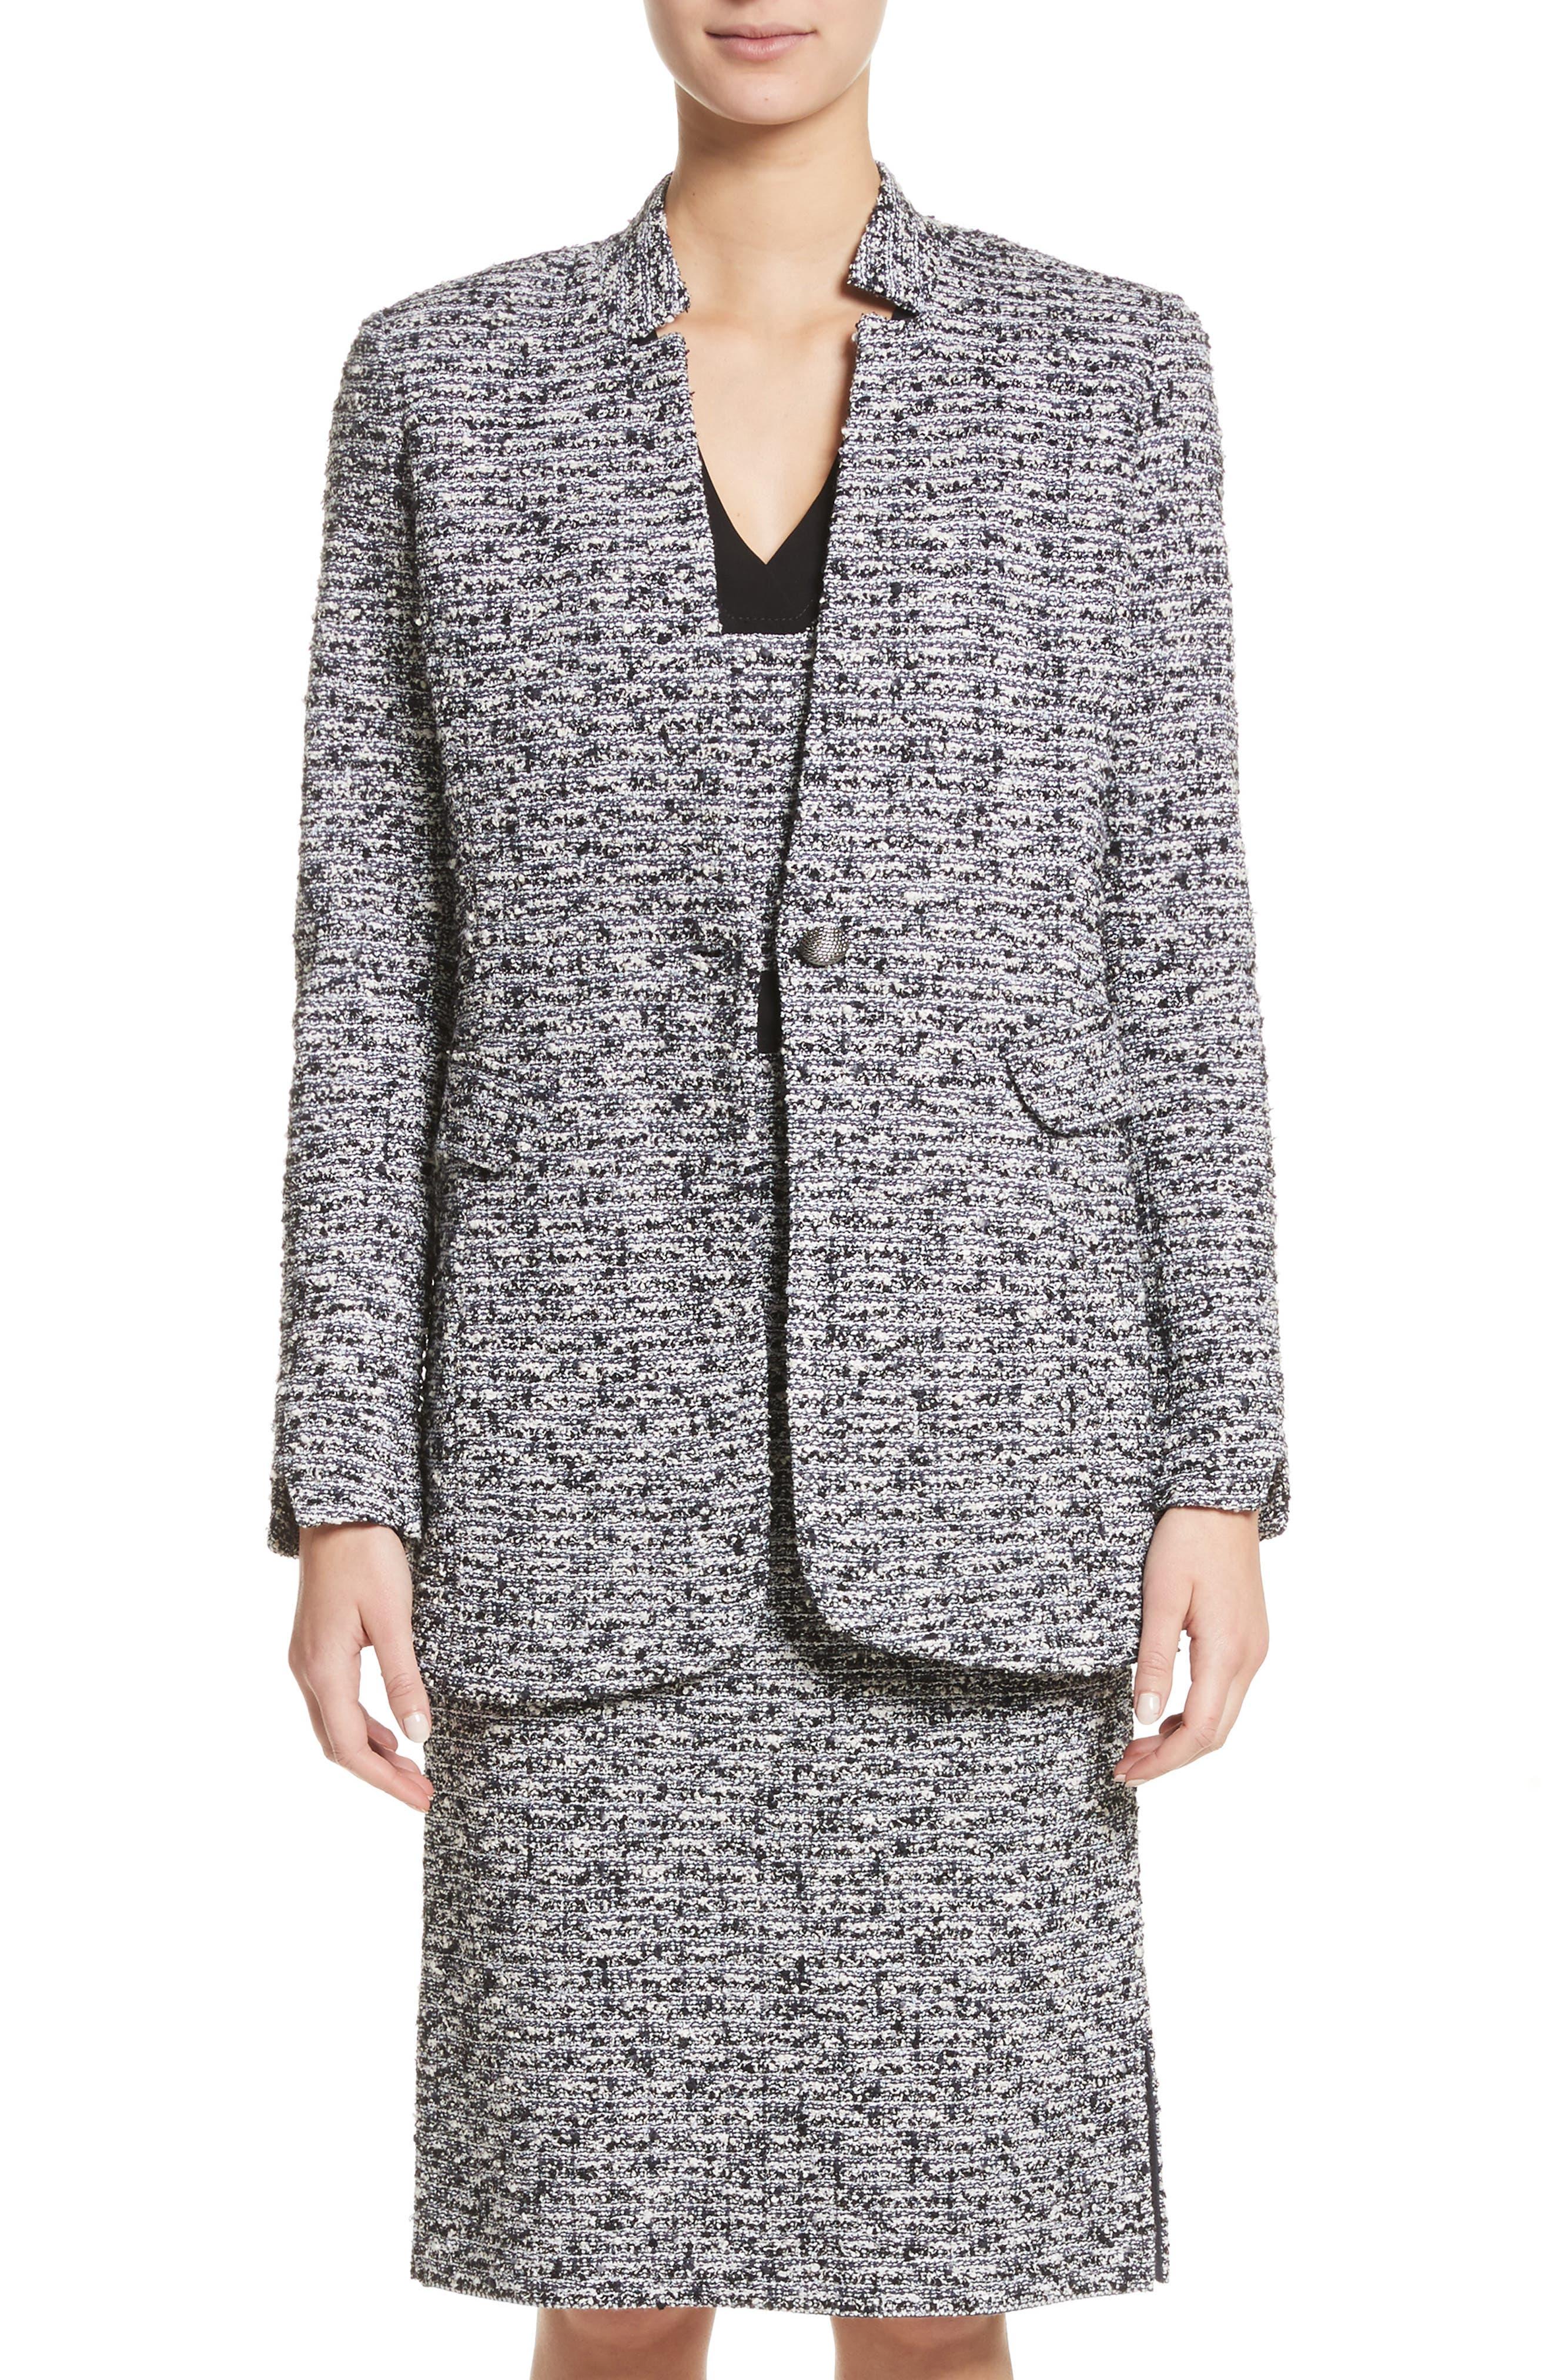 Micro Tweed Blazer,                         Main,                         color, Caviar/ Bianco Multi